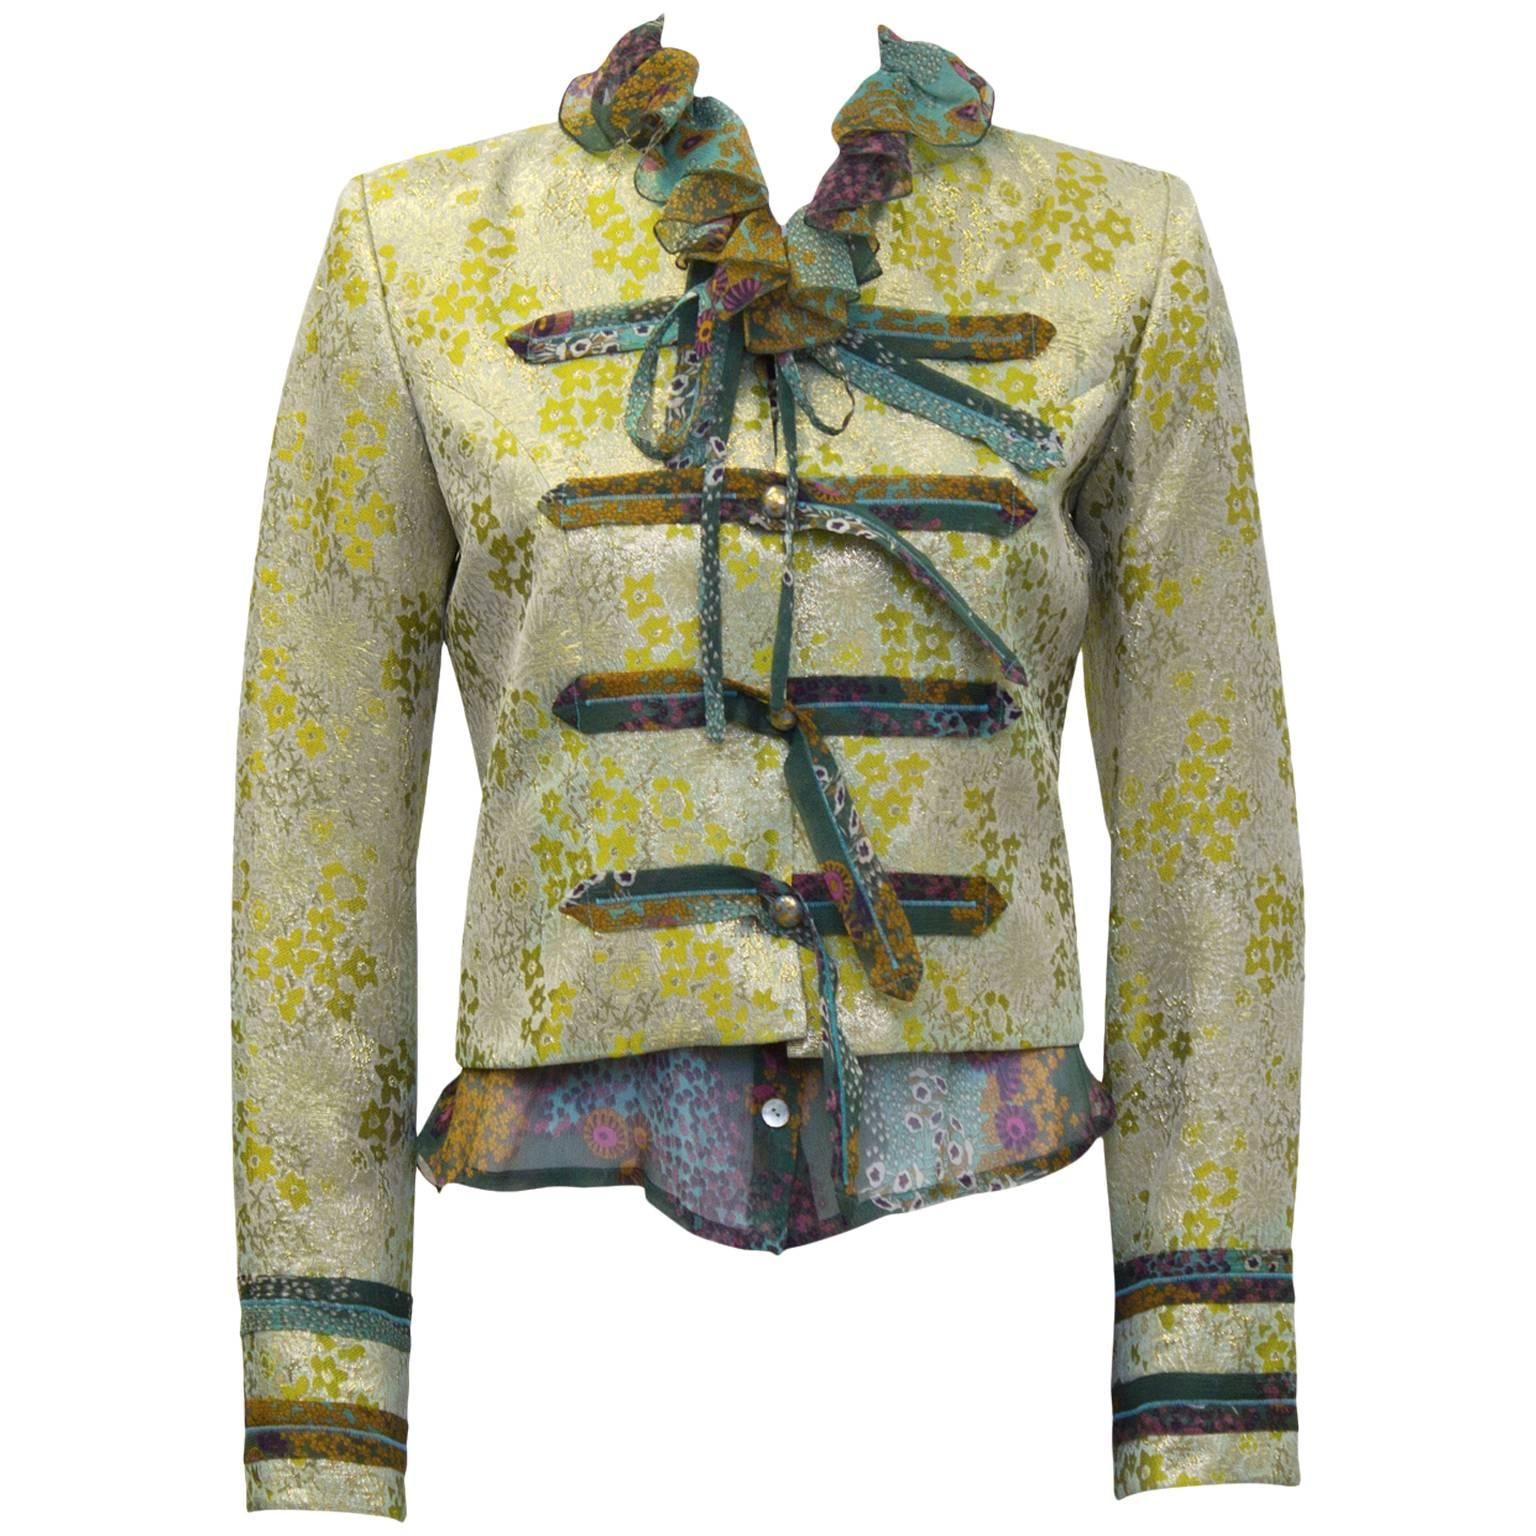 Early 2000's Loulou de la Falaise Brocade Jacket with Floral Blouse